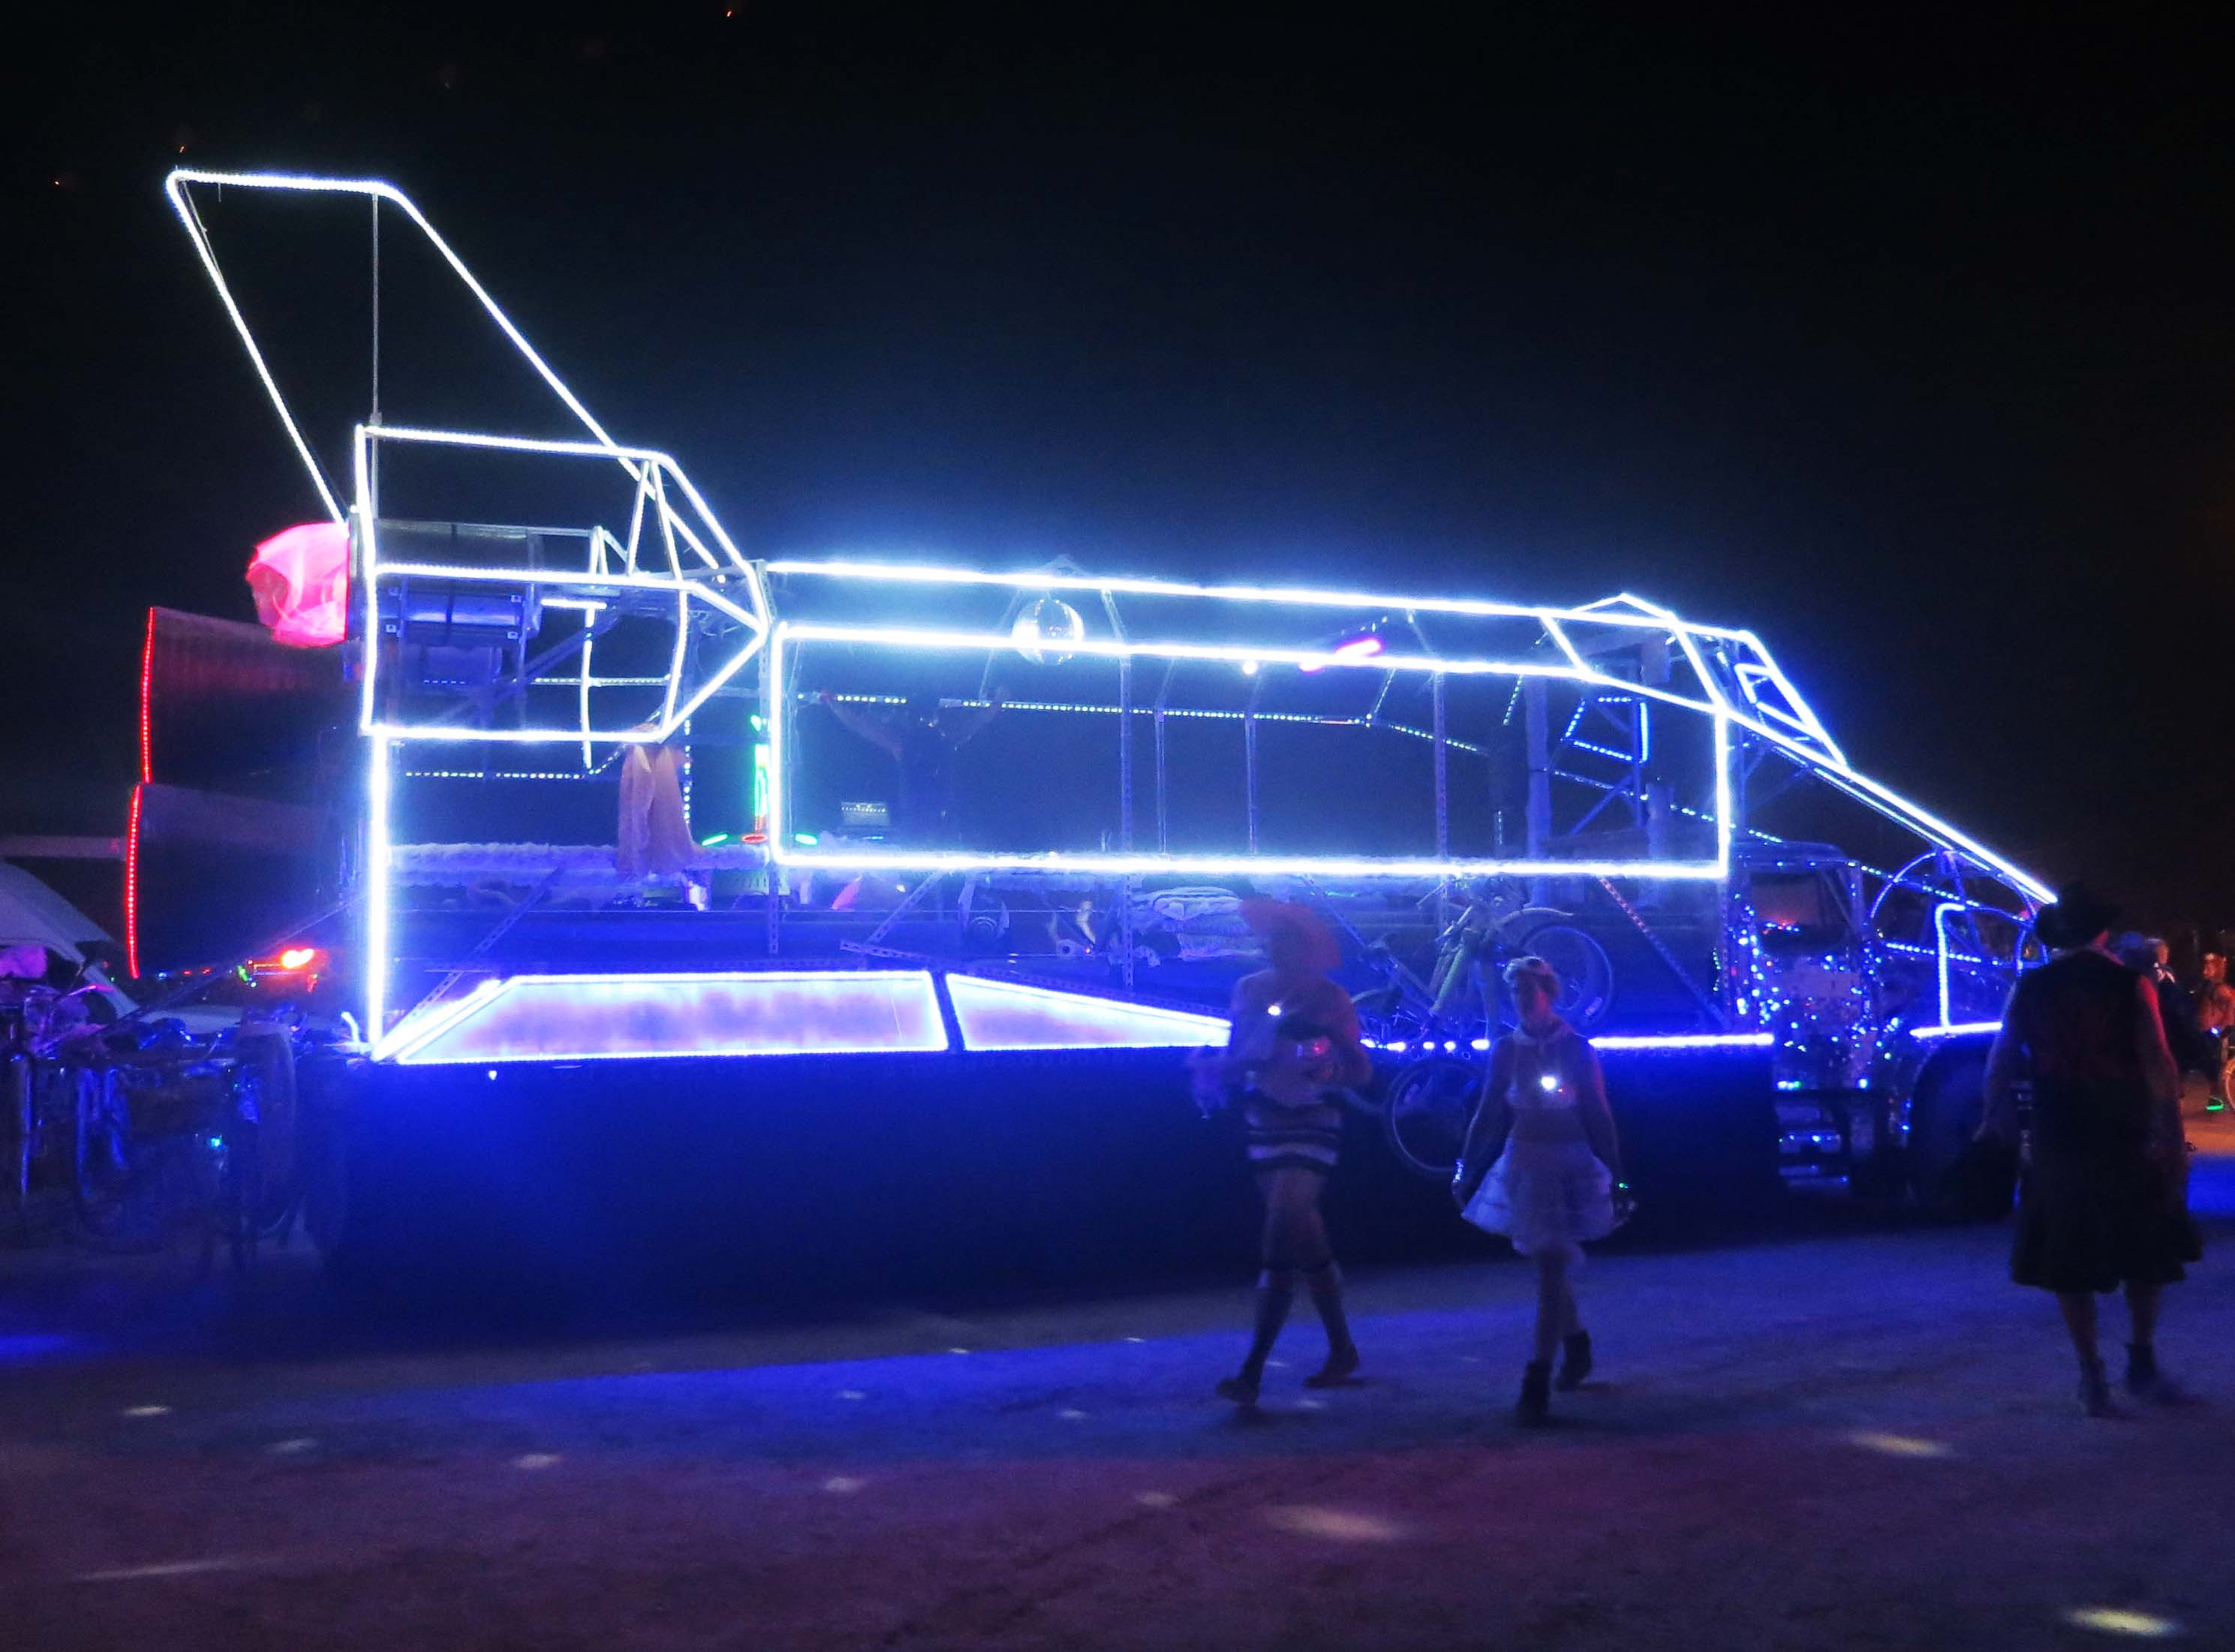 Space Shuttle mutant vehicle at Burning Man 2013.